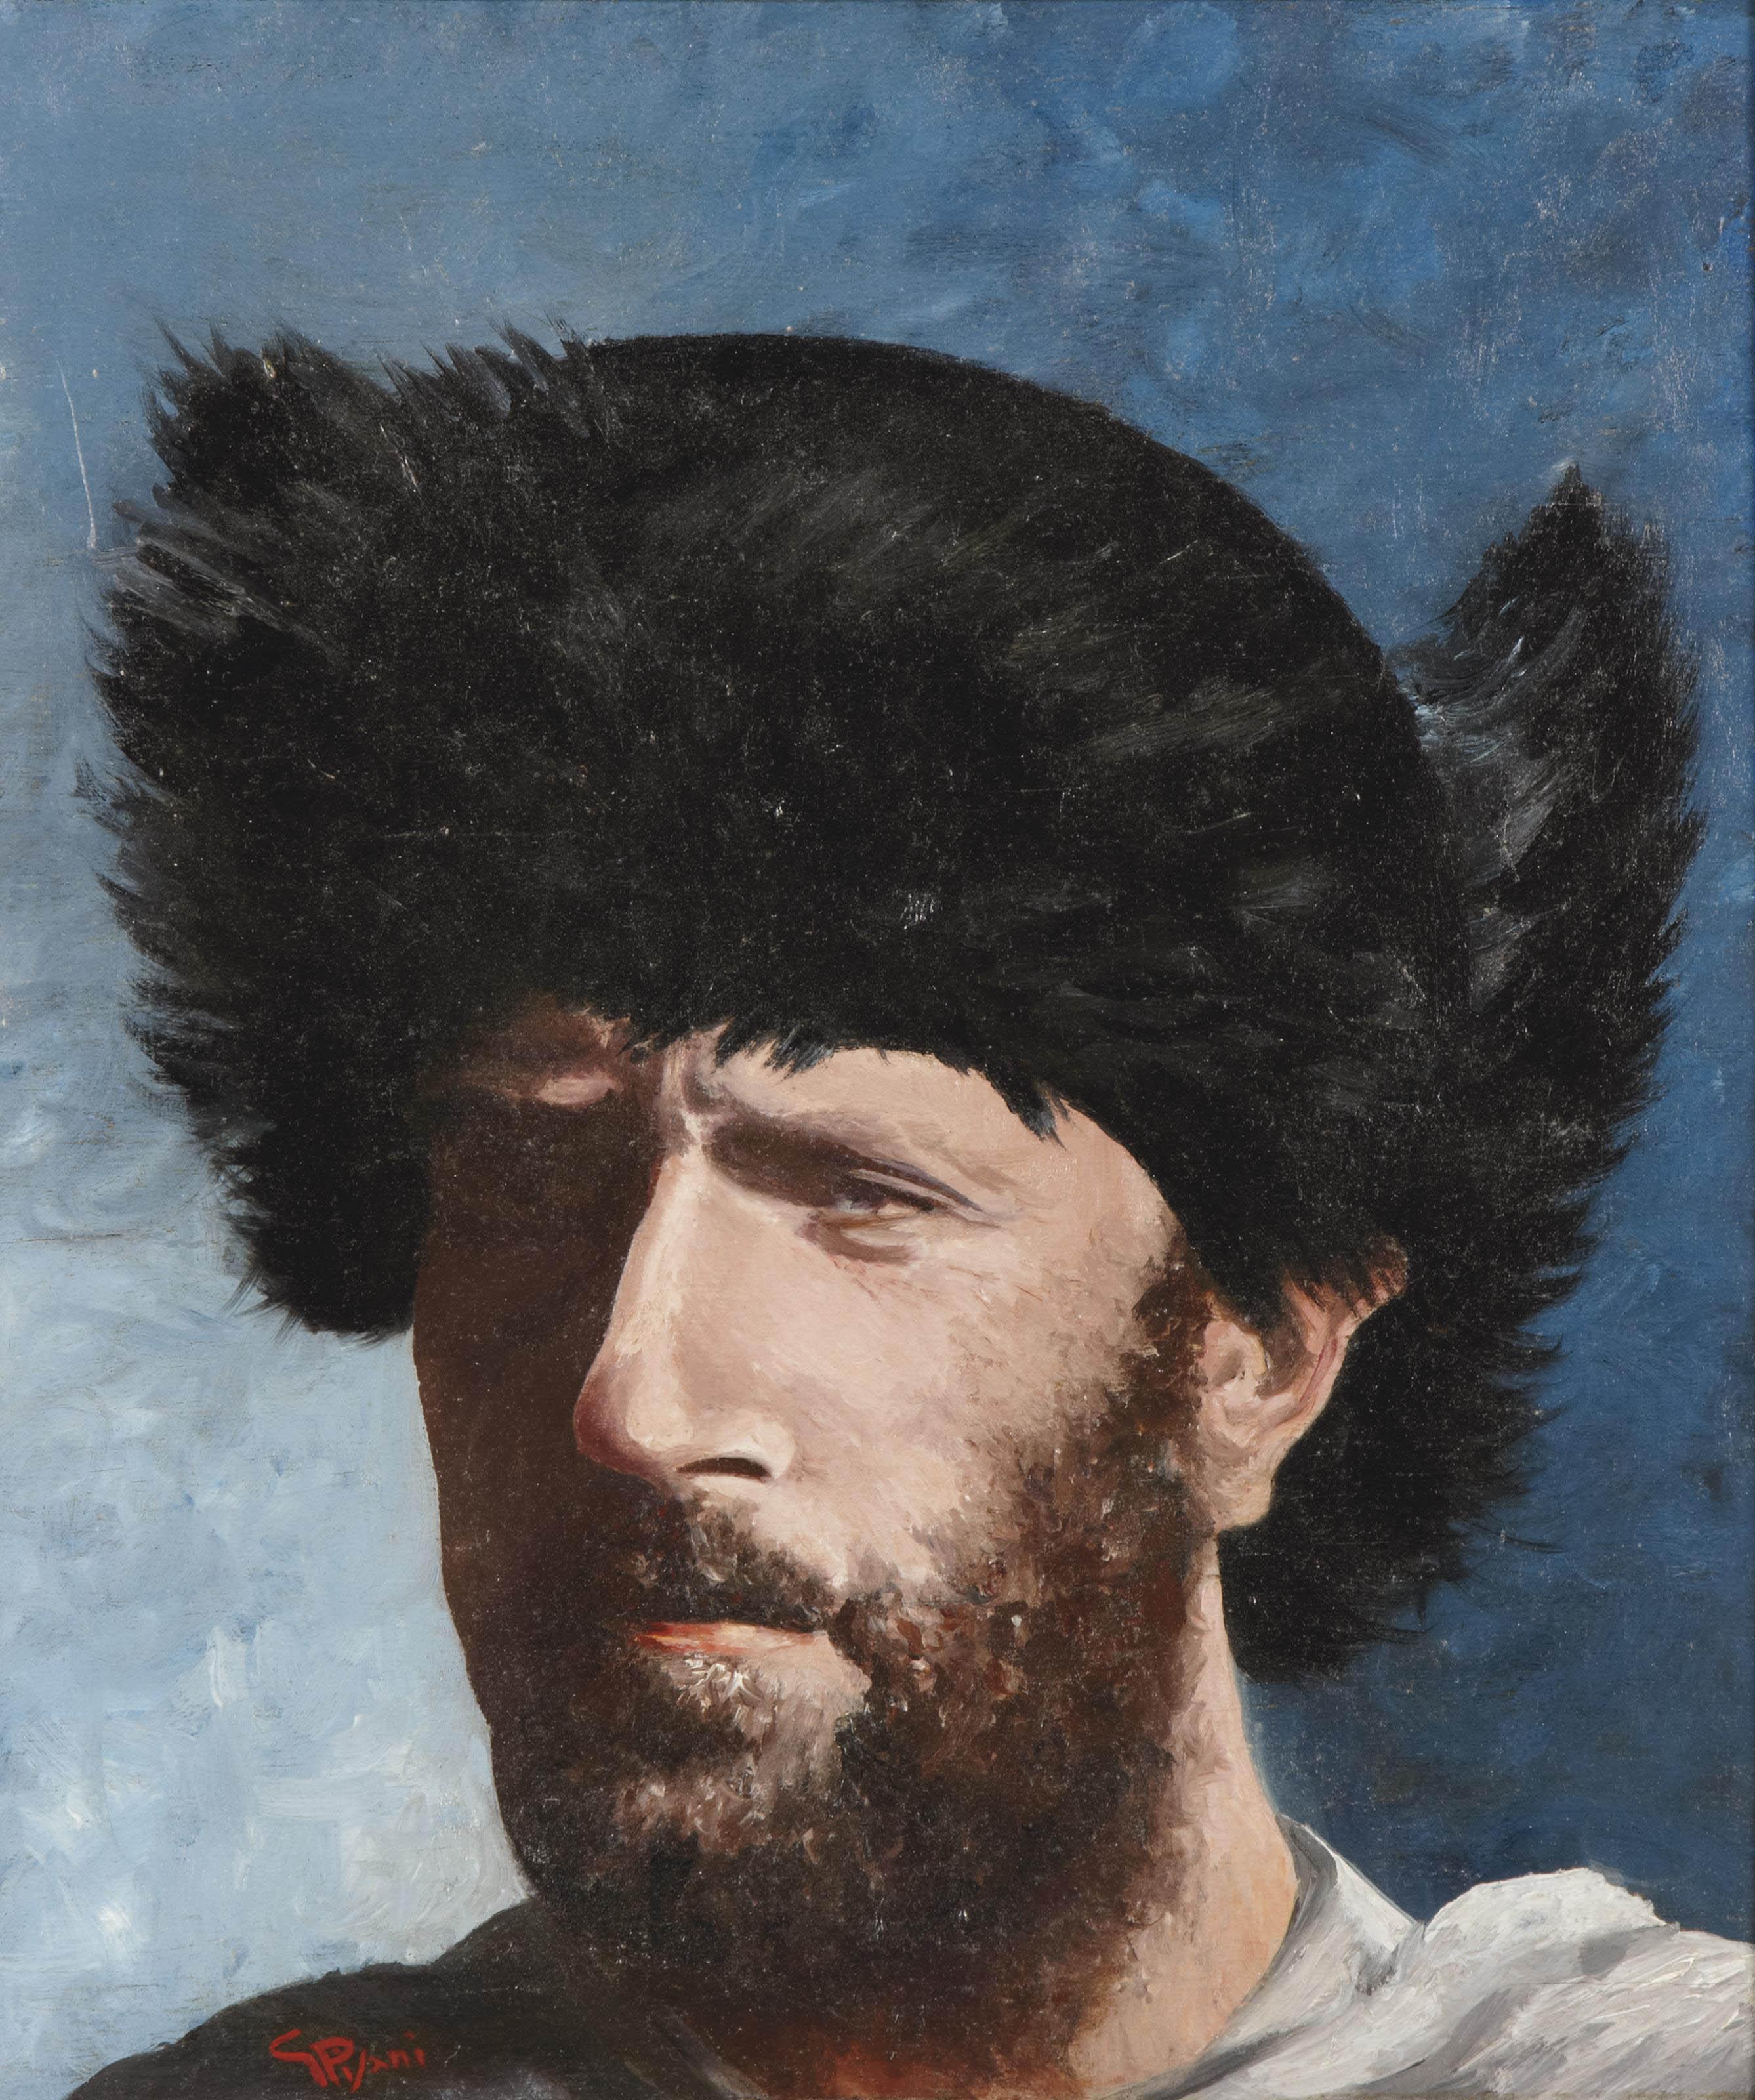 Portrait de Giuseppe Garibaldi portant une chapka